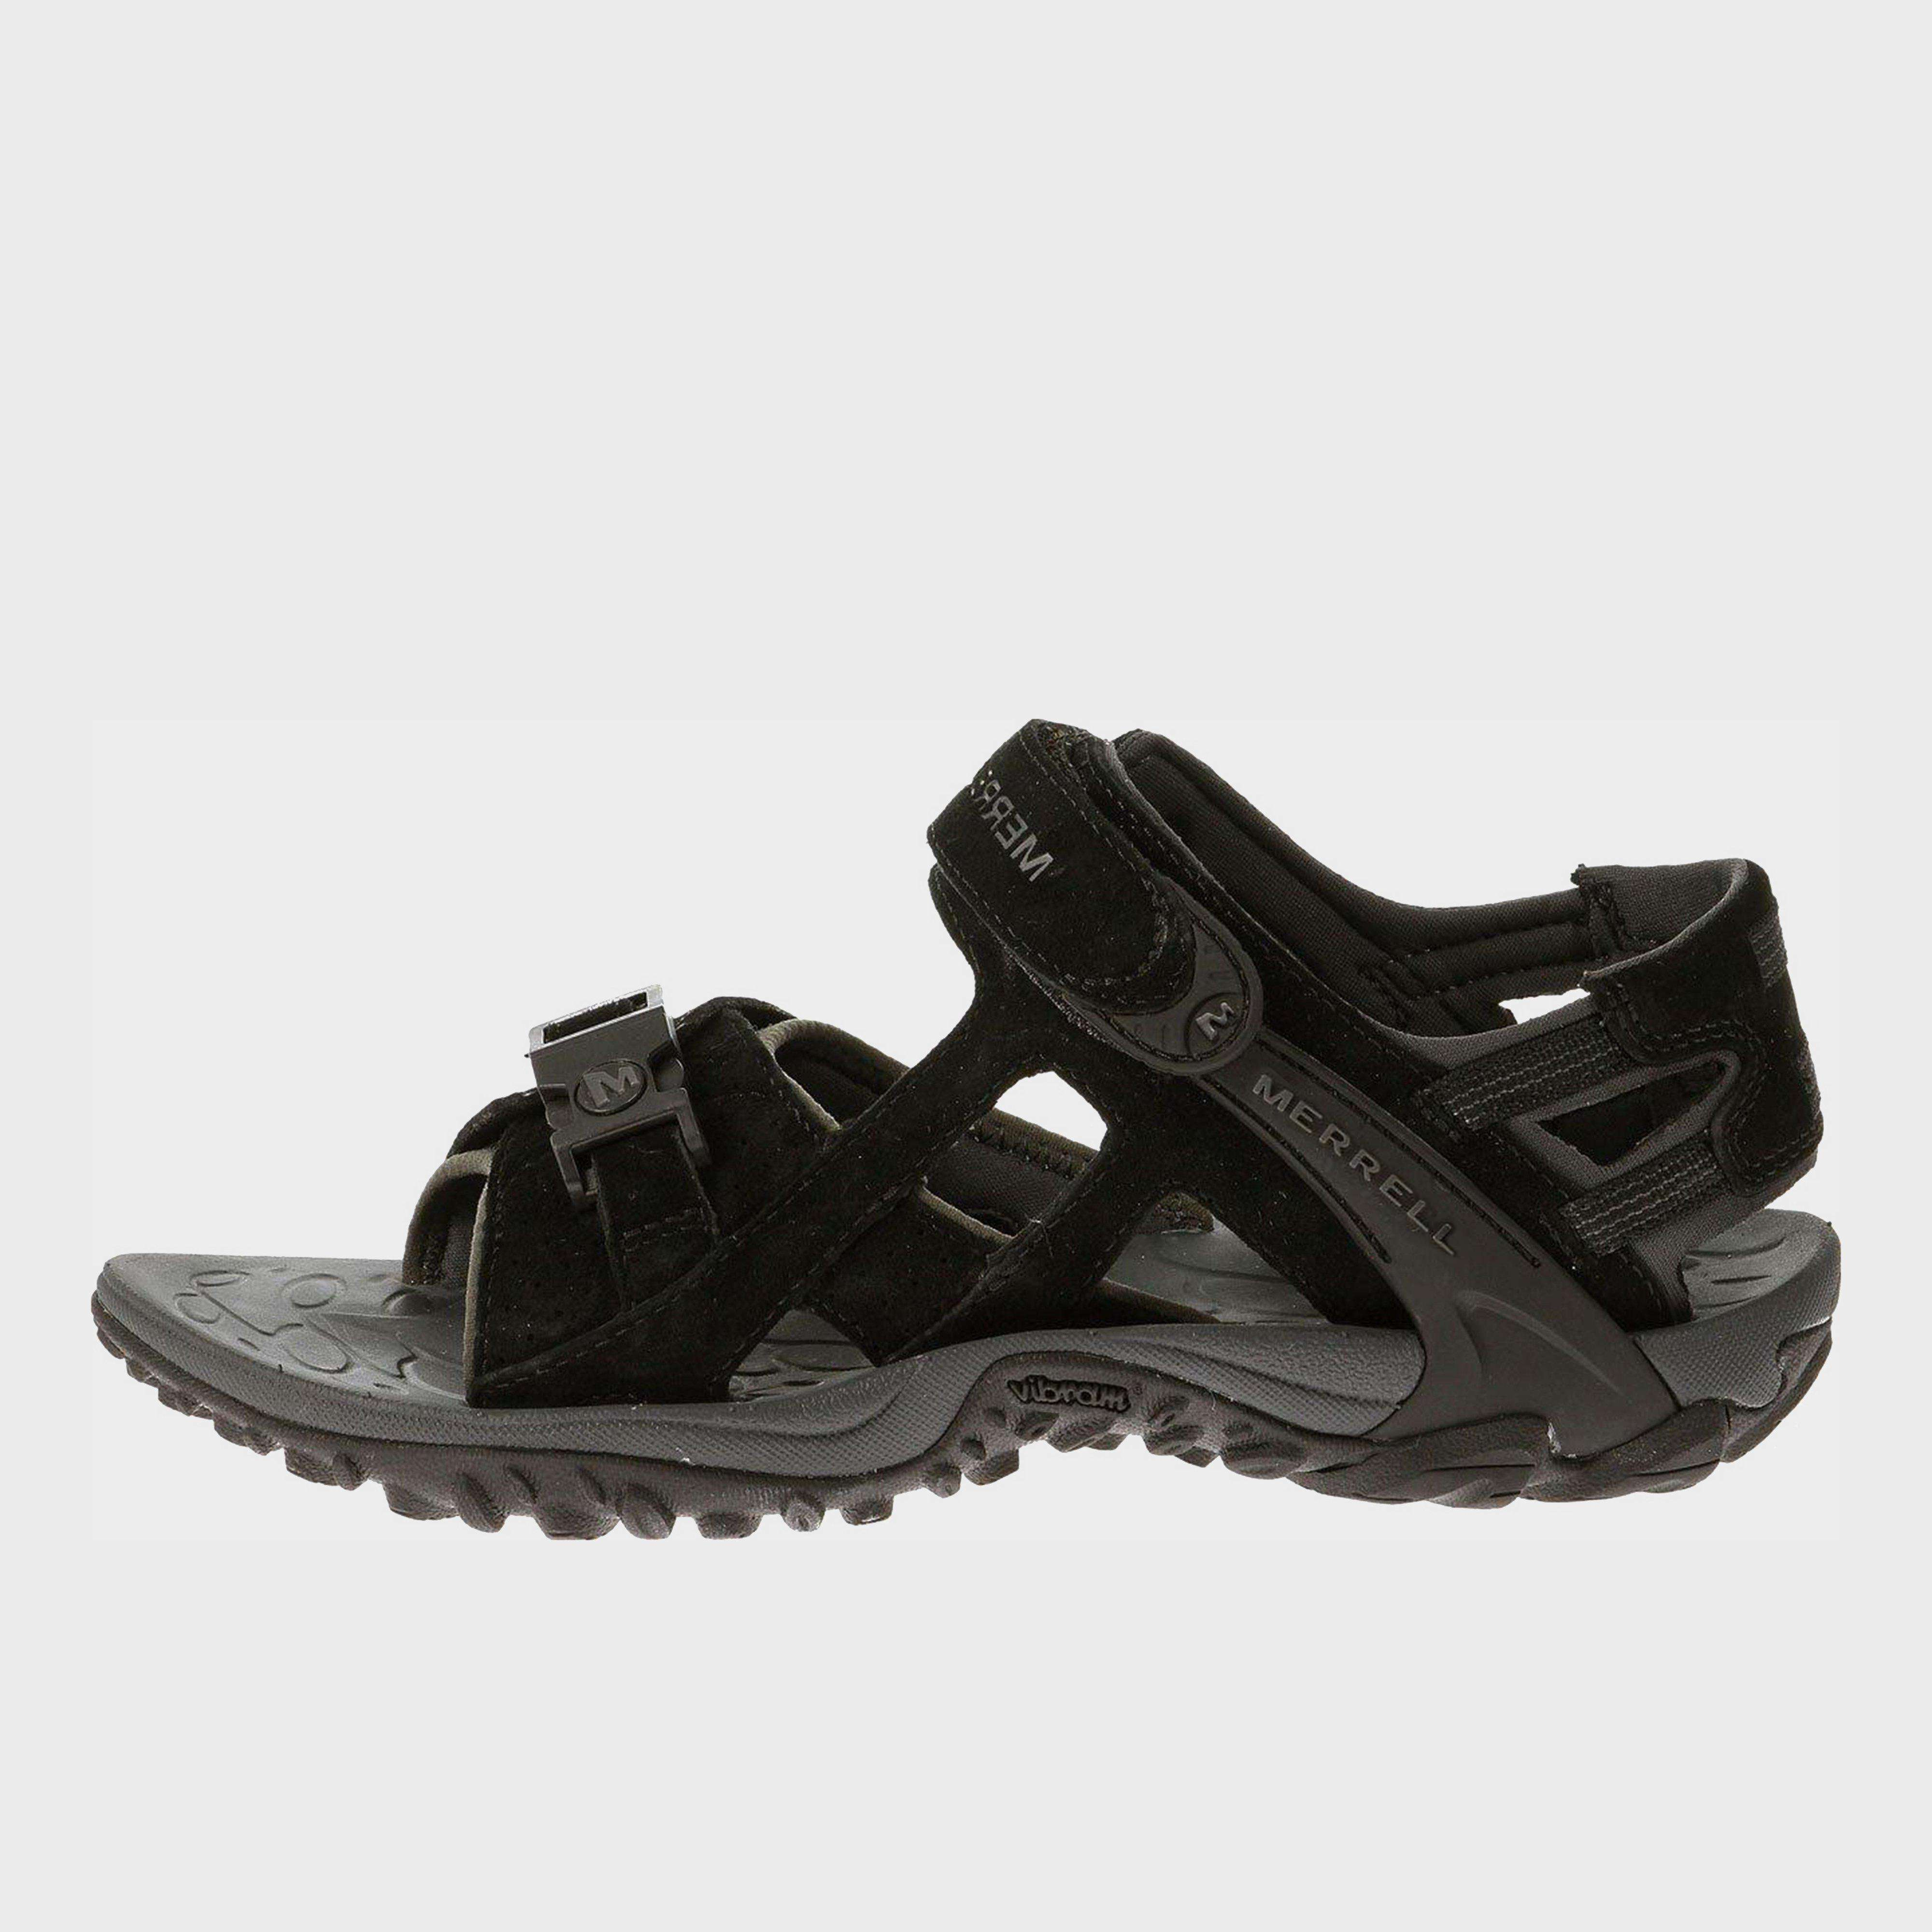 MERRELL Kahuna III Sandals